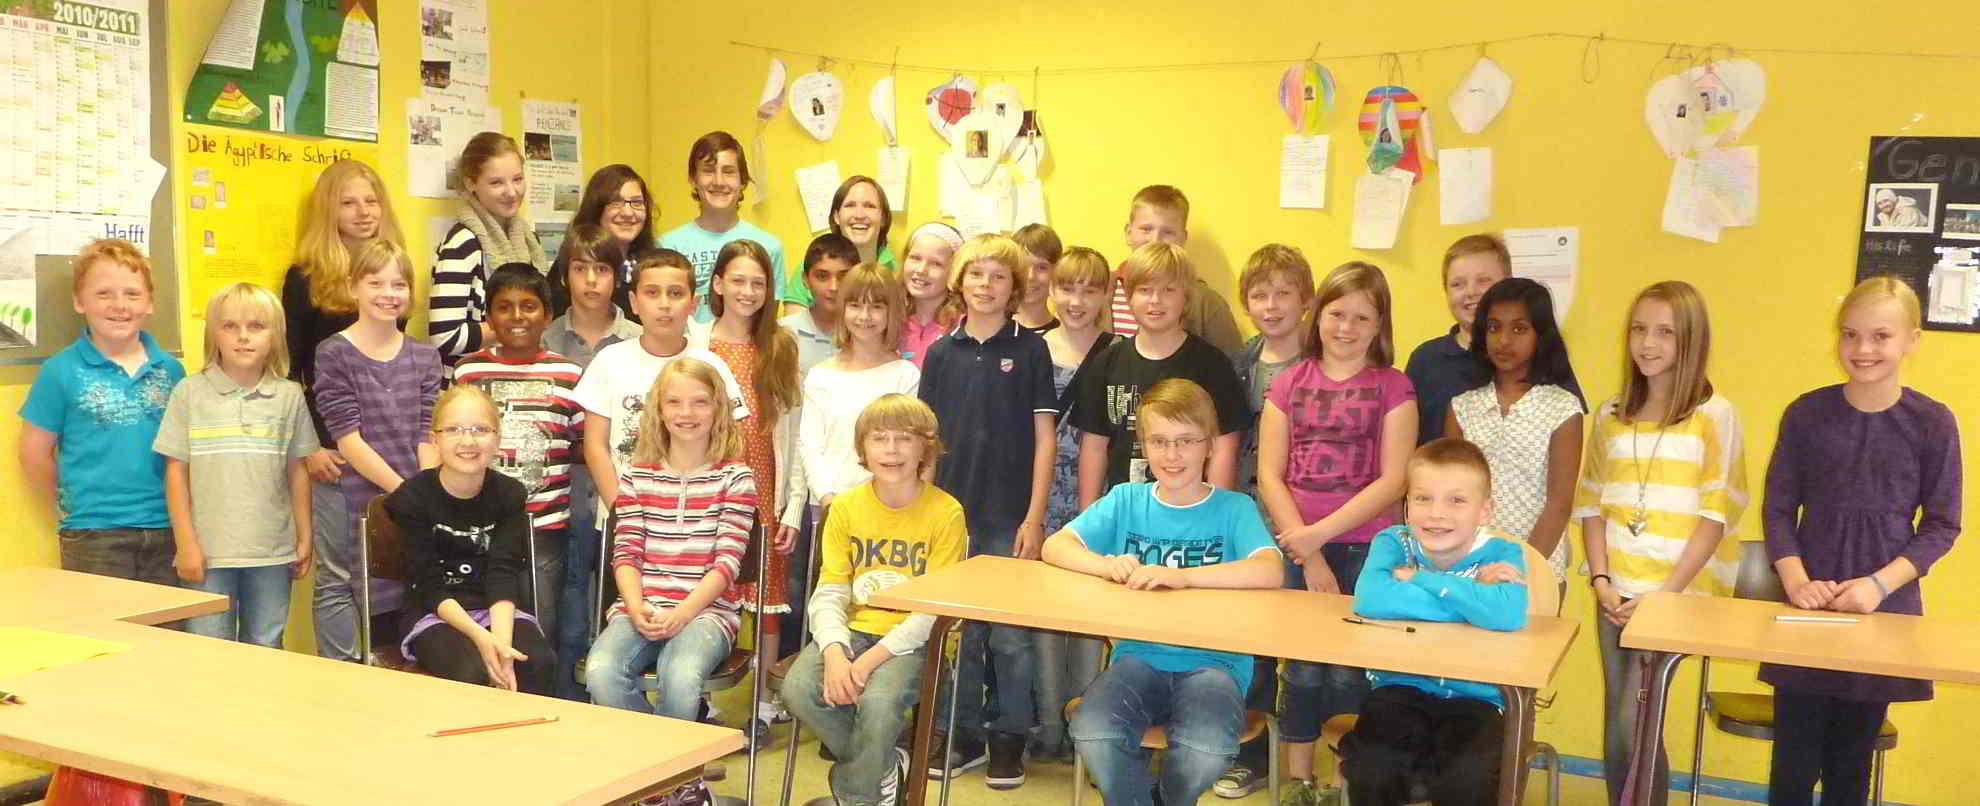 Klasse 5d 2011/12